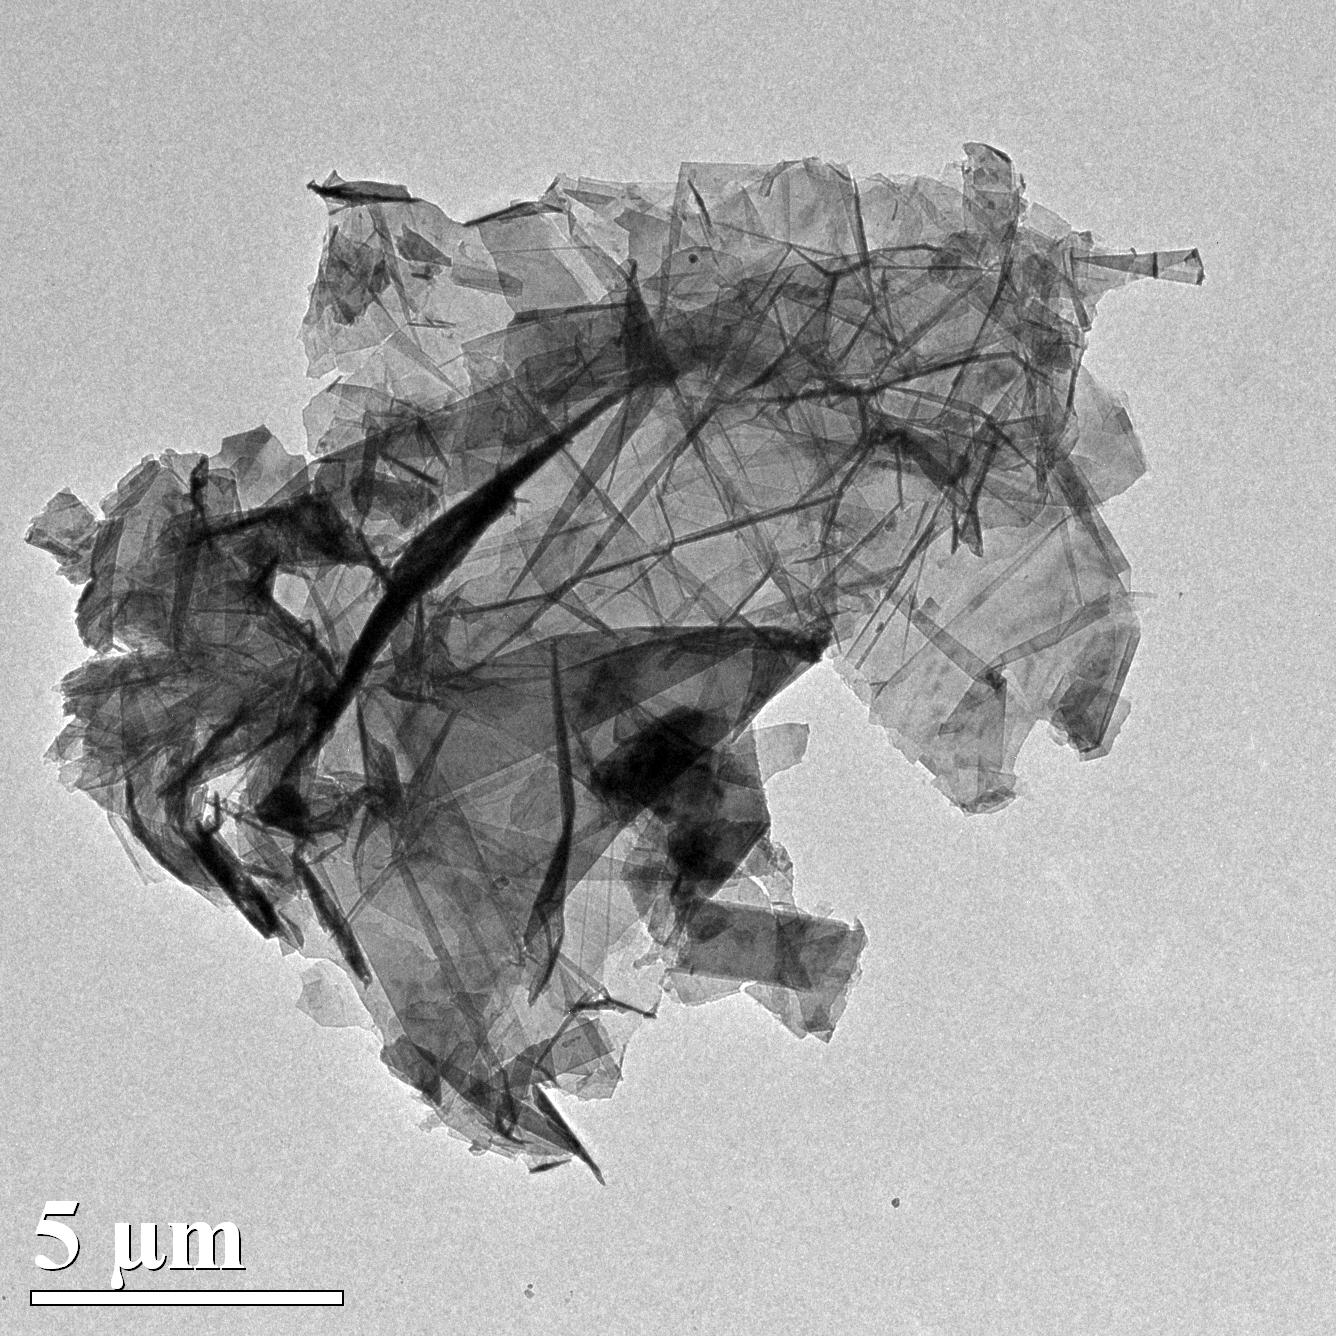 TEM-Graphene Nanoplatelets